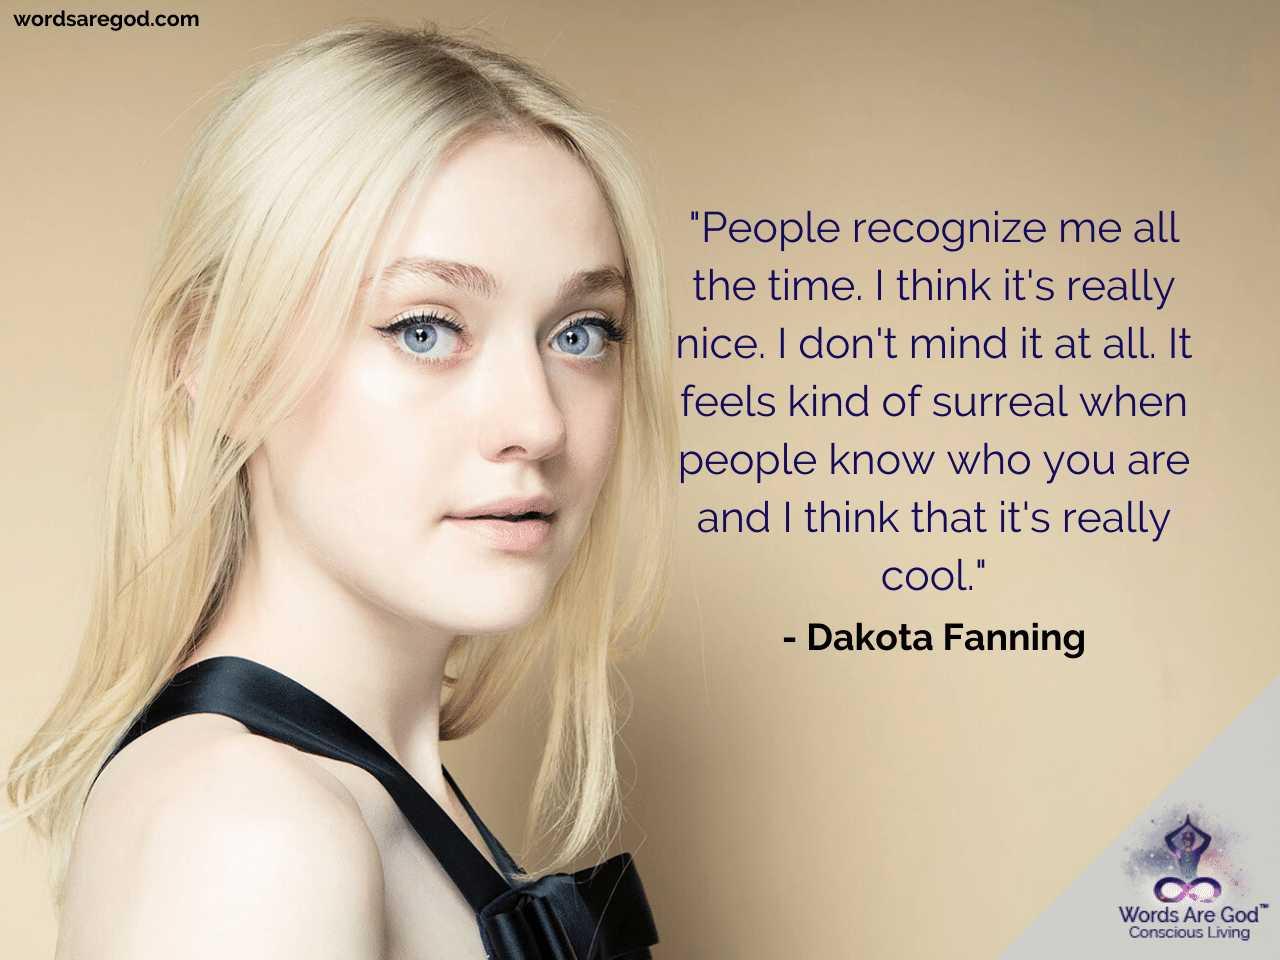 Dakota Fanning Best Quotes by Dakota Fanning